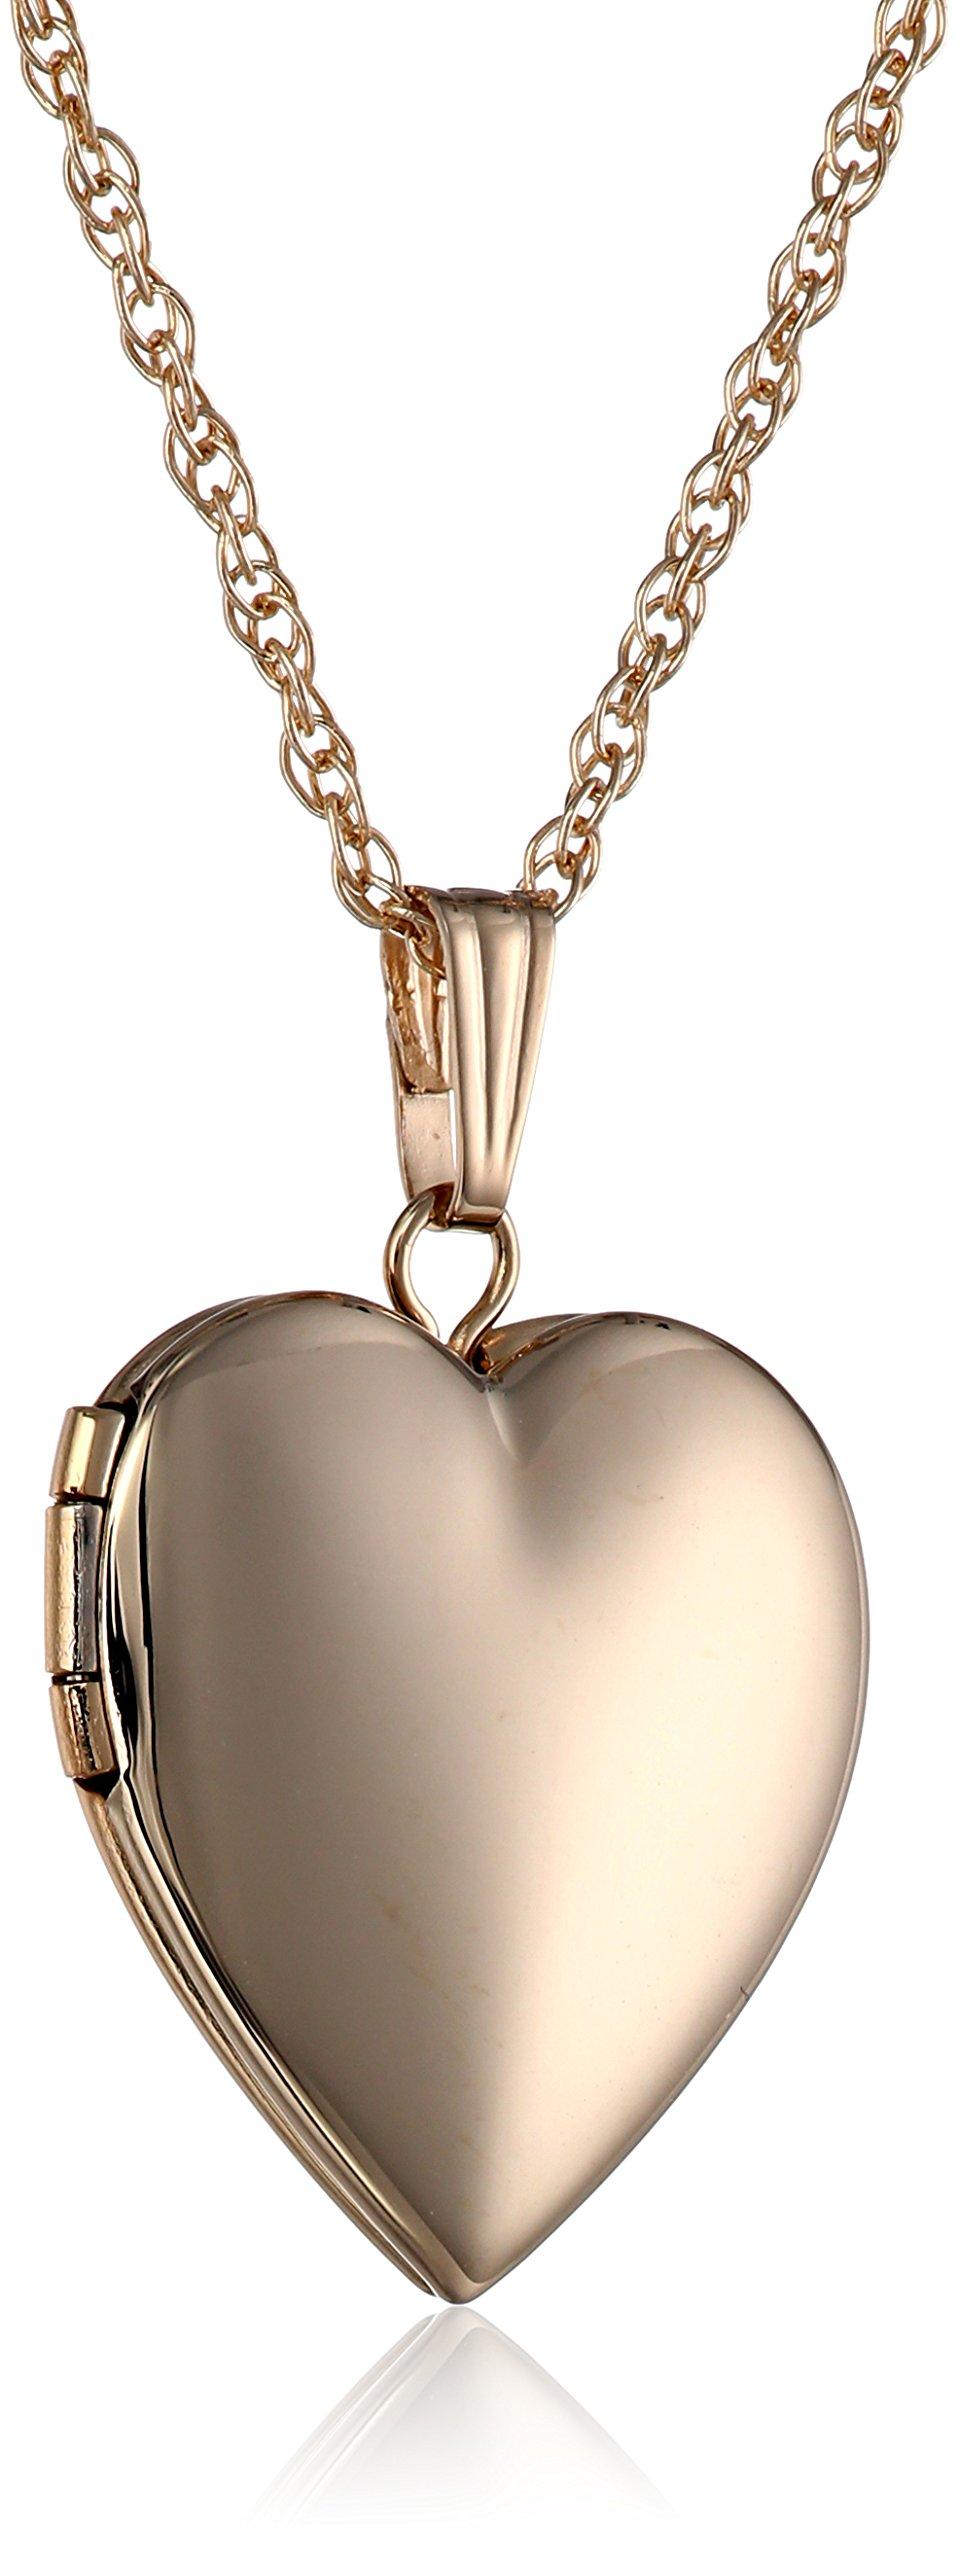 14k Yellow Gold Polished Heart Locket Necklace, 18''